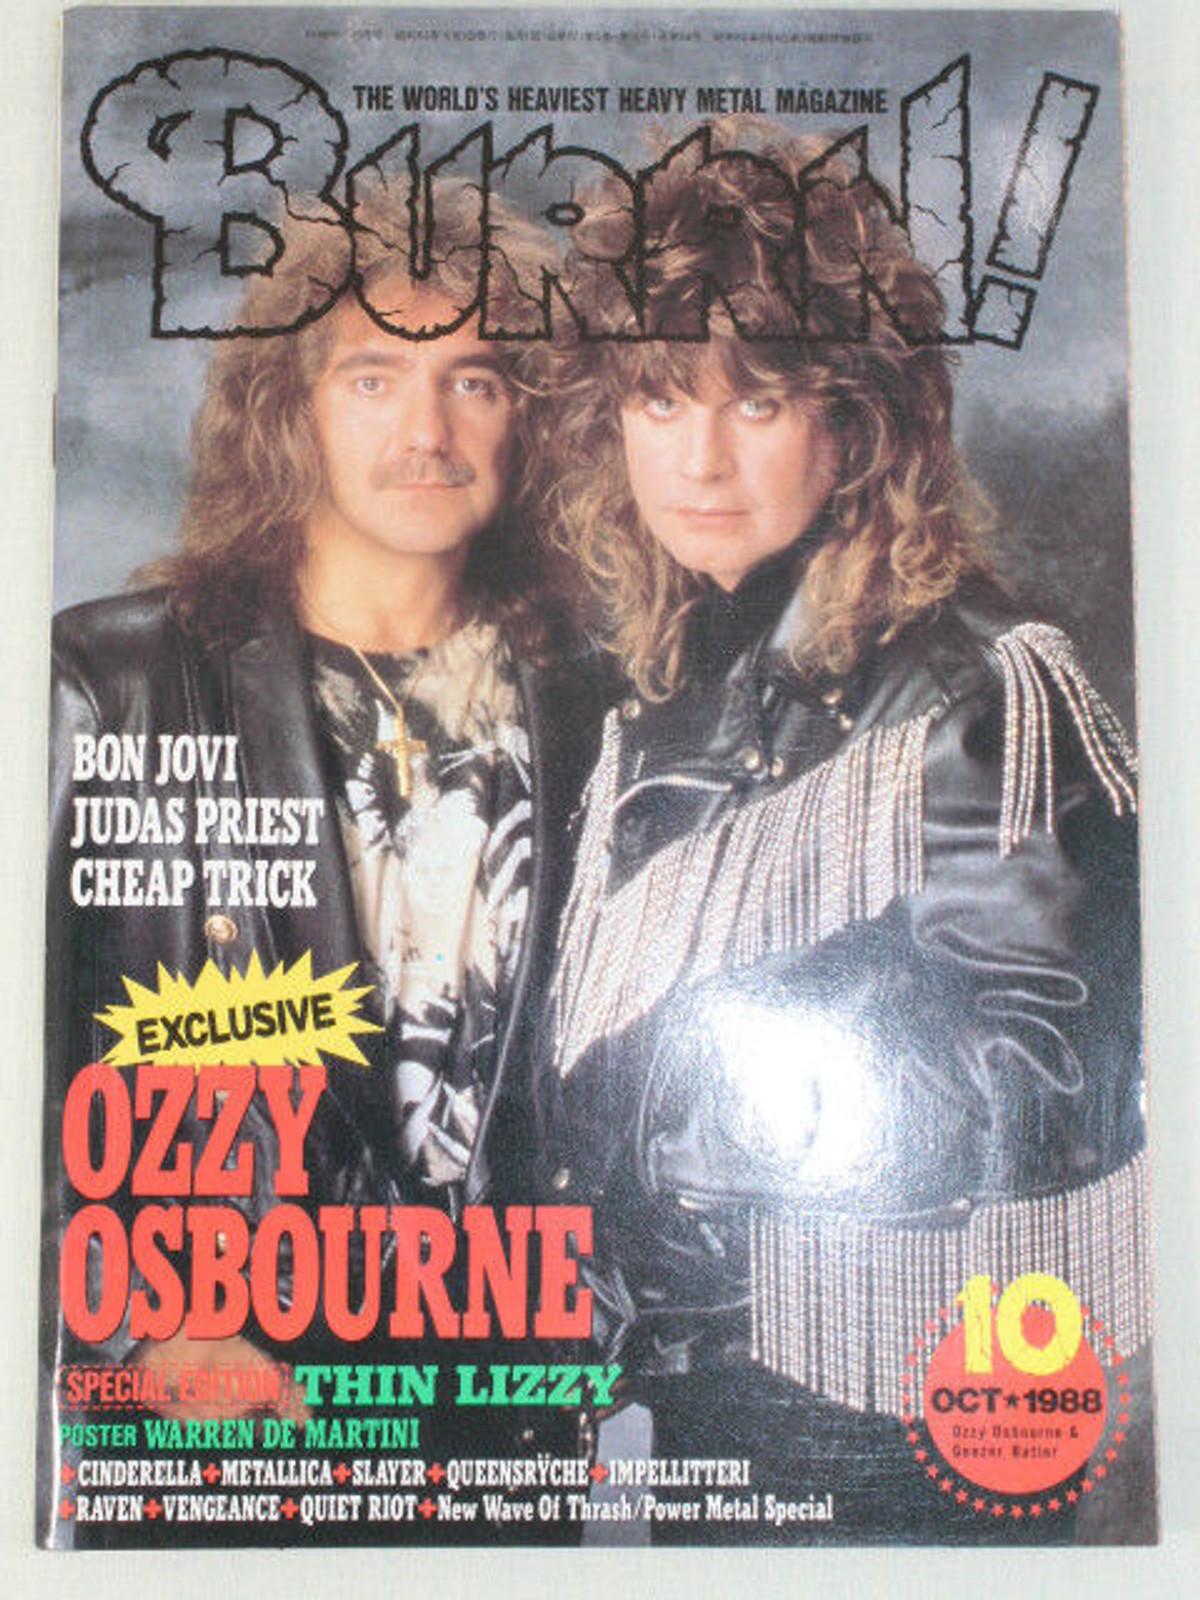 1988/10 BURRN! Japan Rock Magazine OZZY OSBOURNE/BON JOVI/JUDAS PRIEST/RAVEN